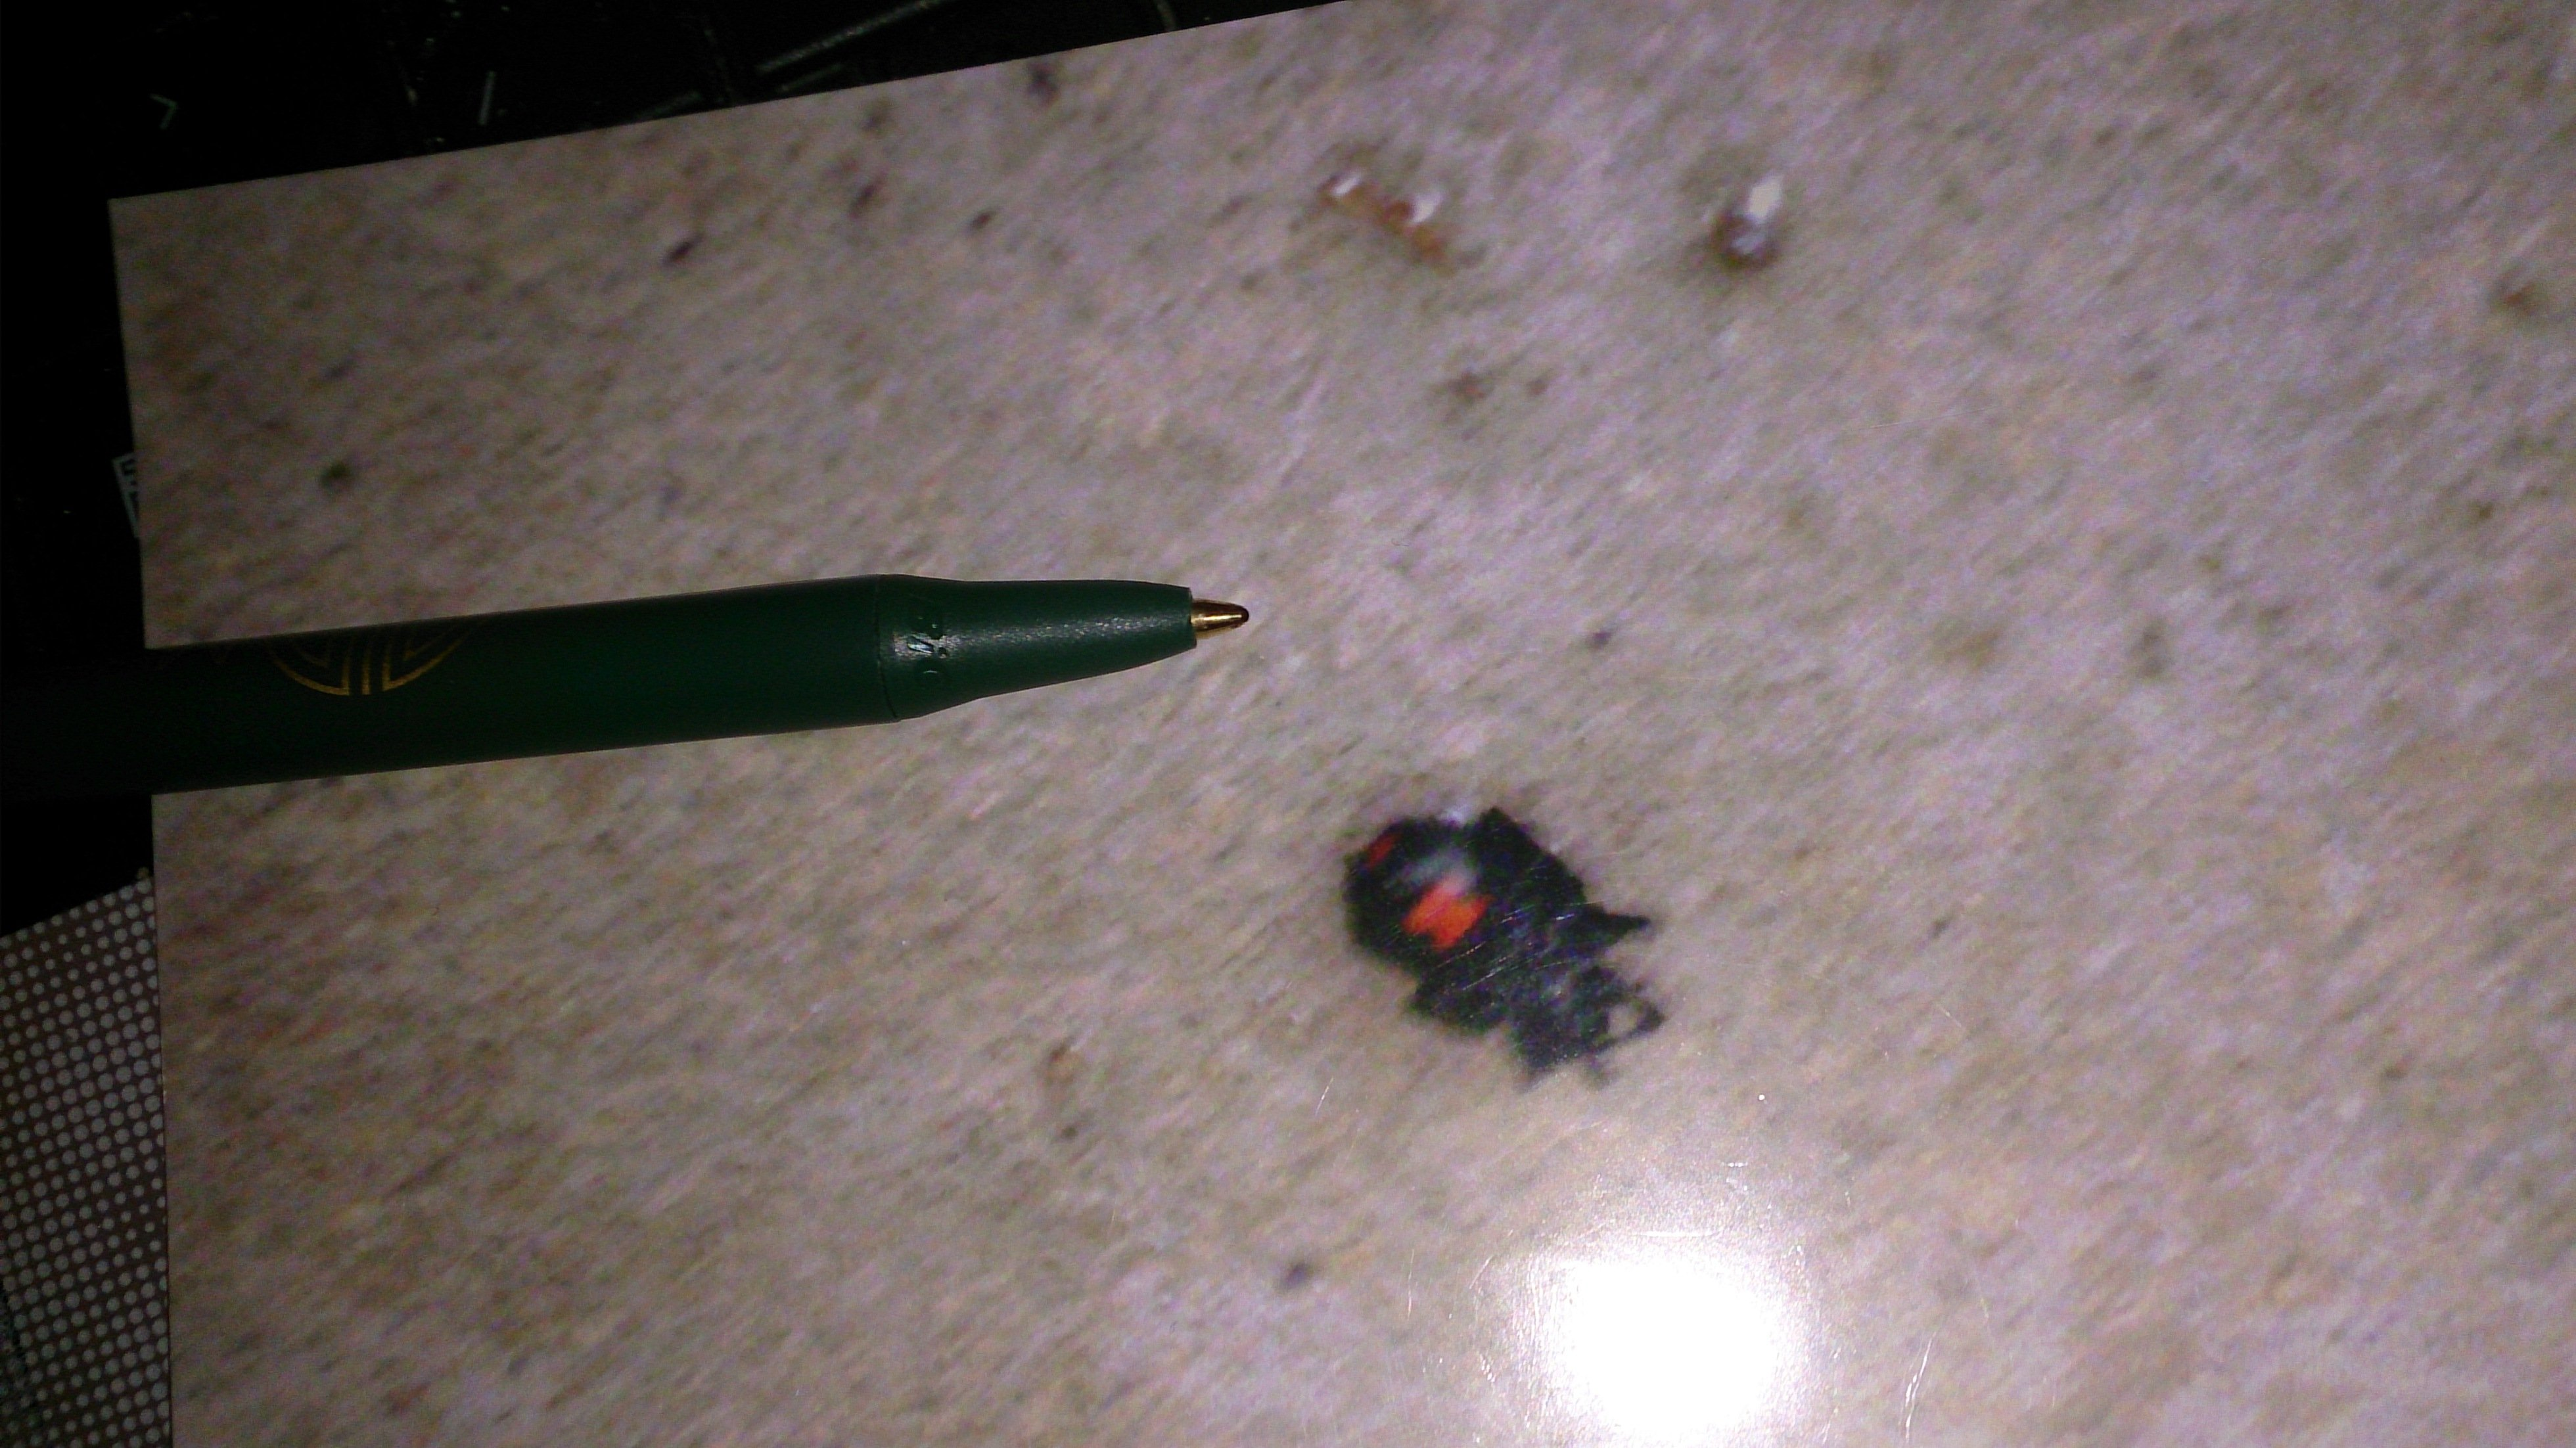 On-site pest control service in Lexington, KY